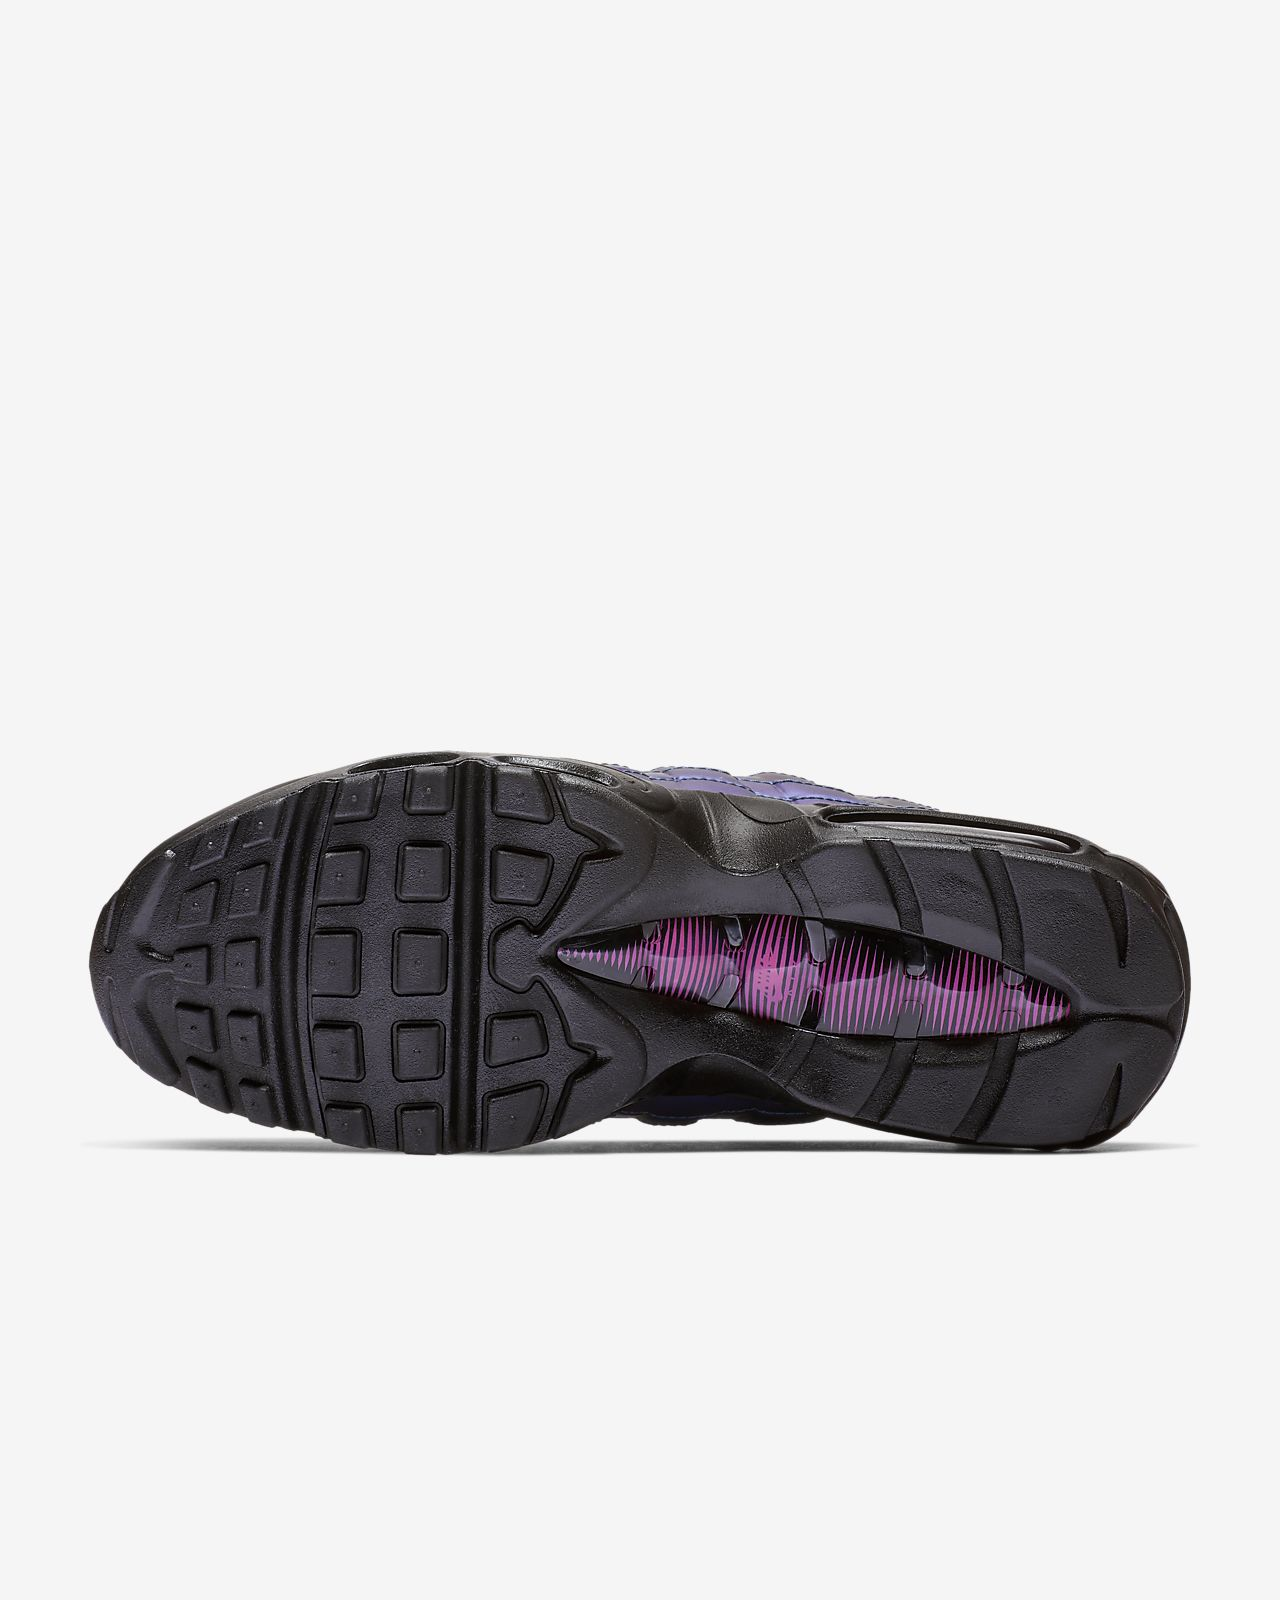 online store c3751 757da Nike Air Max 95 Premium Men's Shoe. Nike.com AU